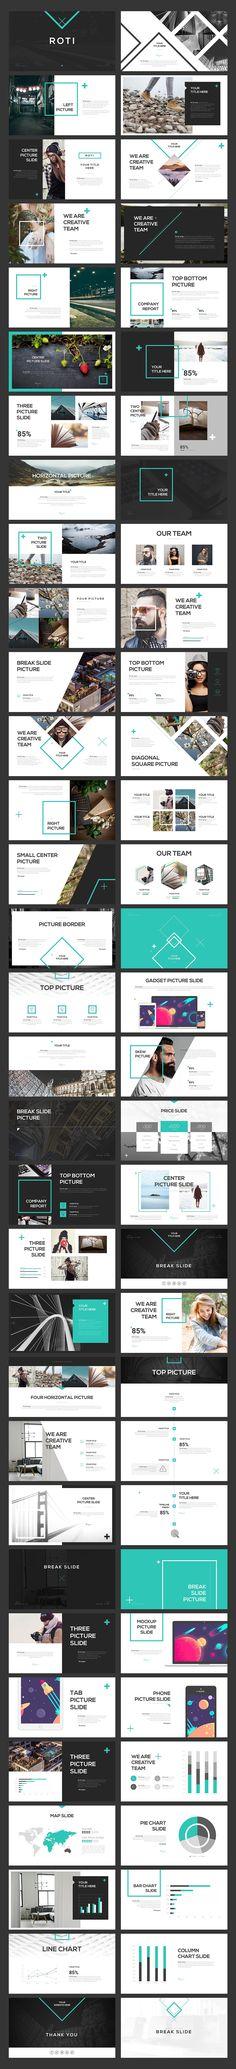 42 best best powerpoint templates images on pinterest keynote roti keynote template by angkalimabelas on creativemarket toneelgroepblik Image collections